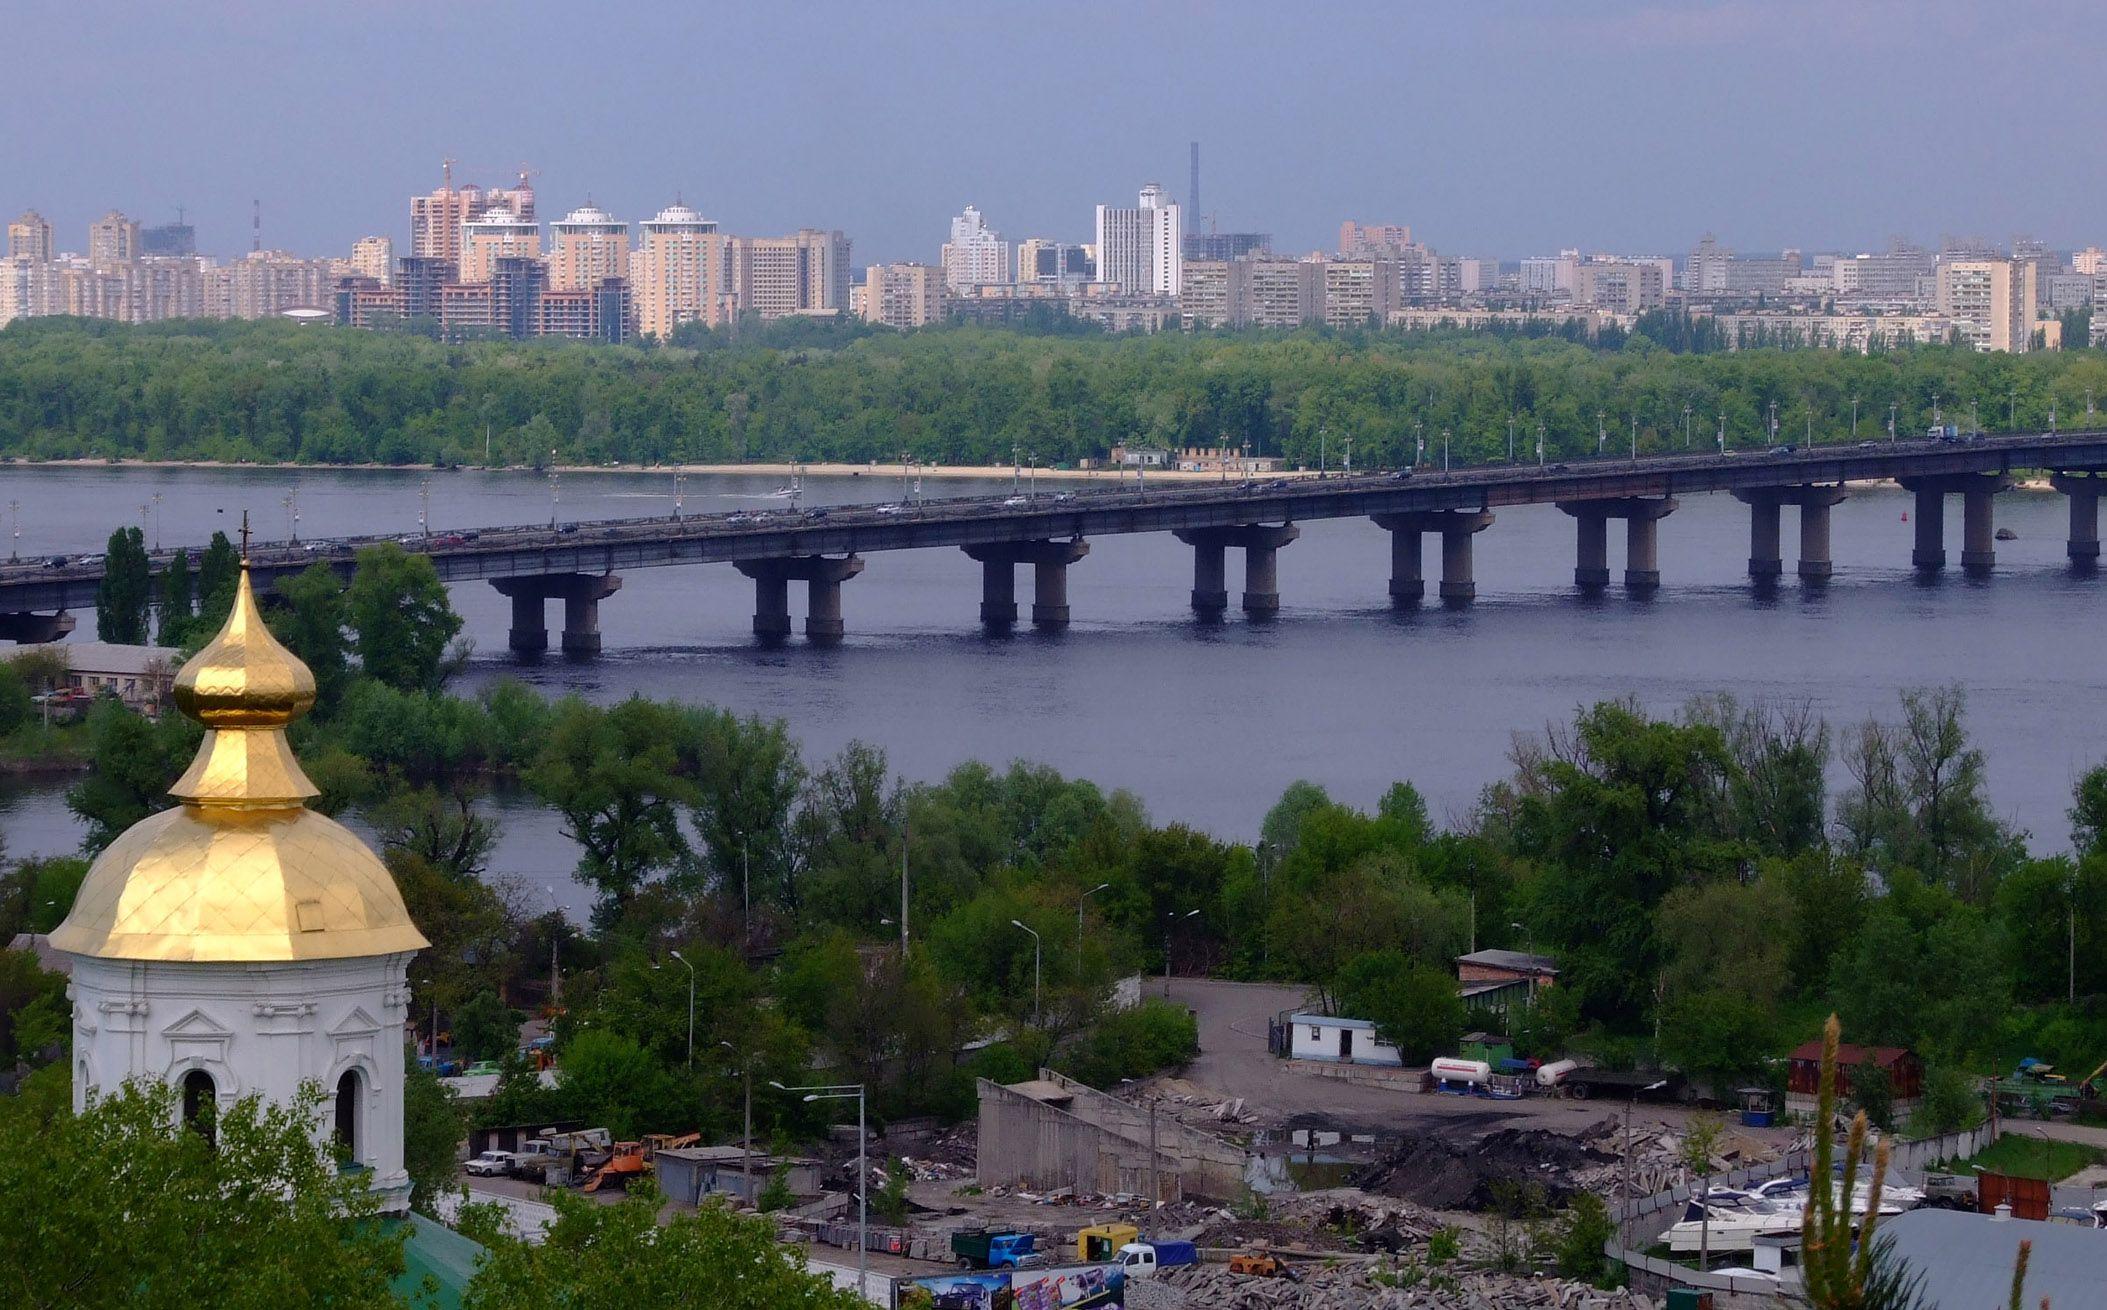 Київські мости академіка Євгена Патона